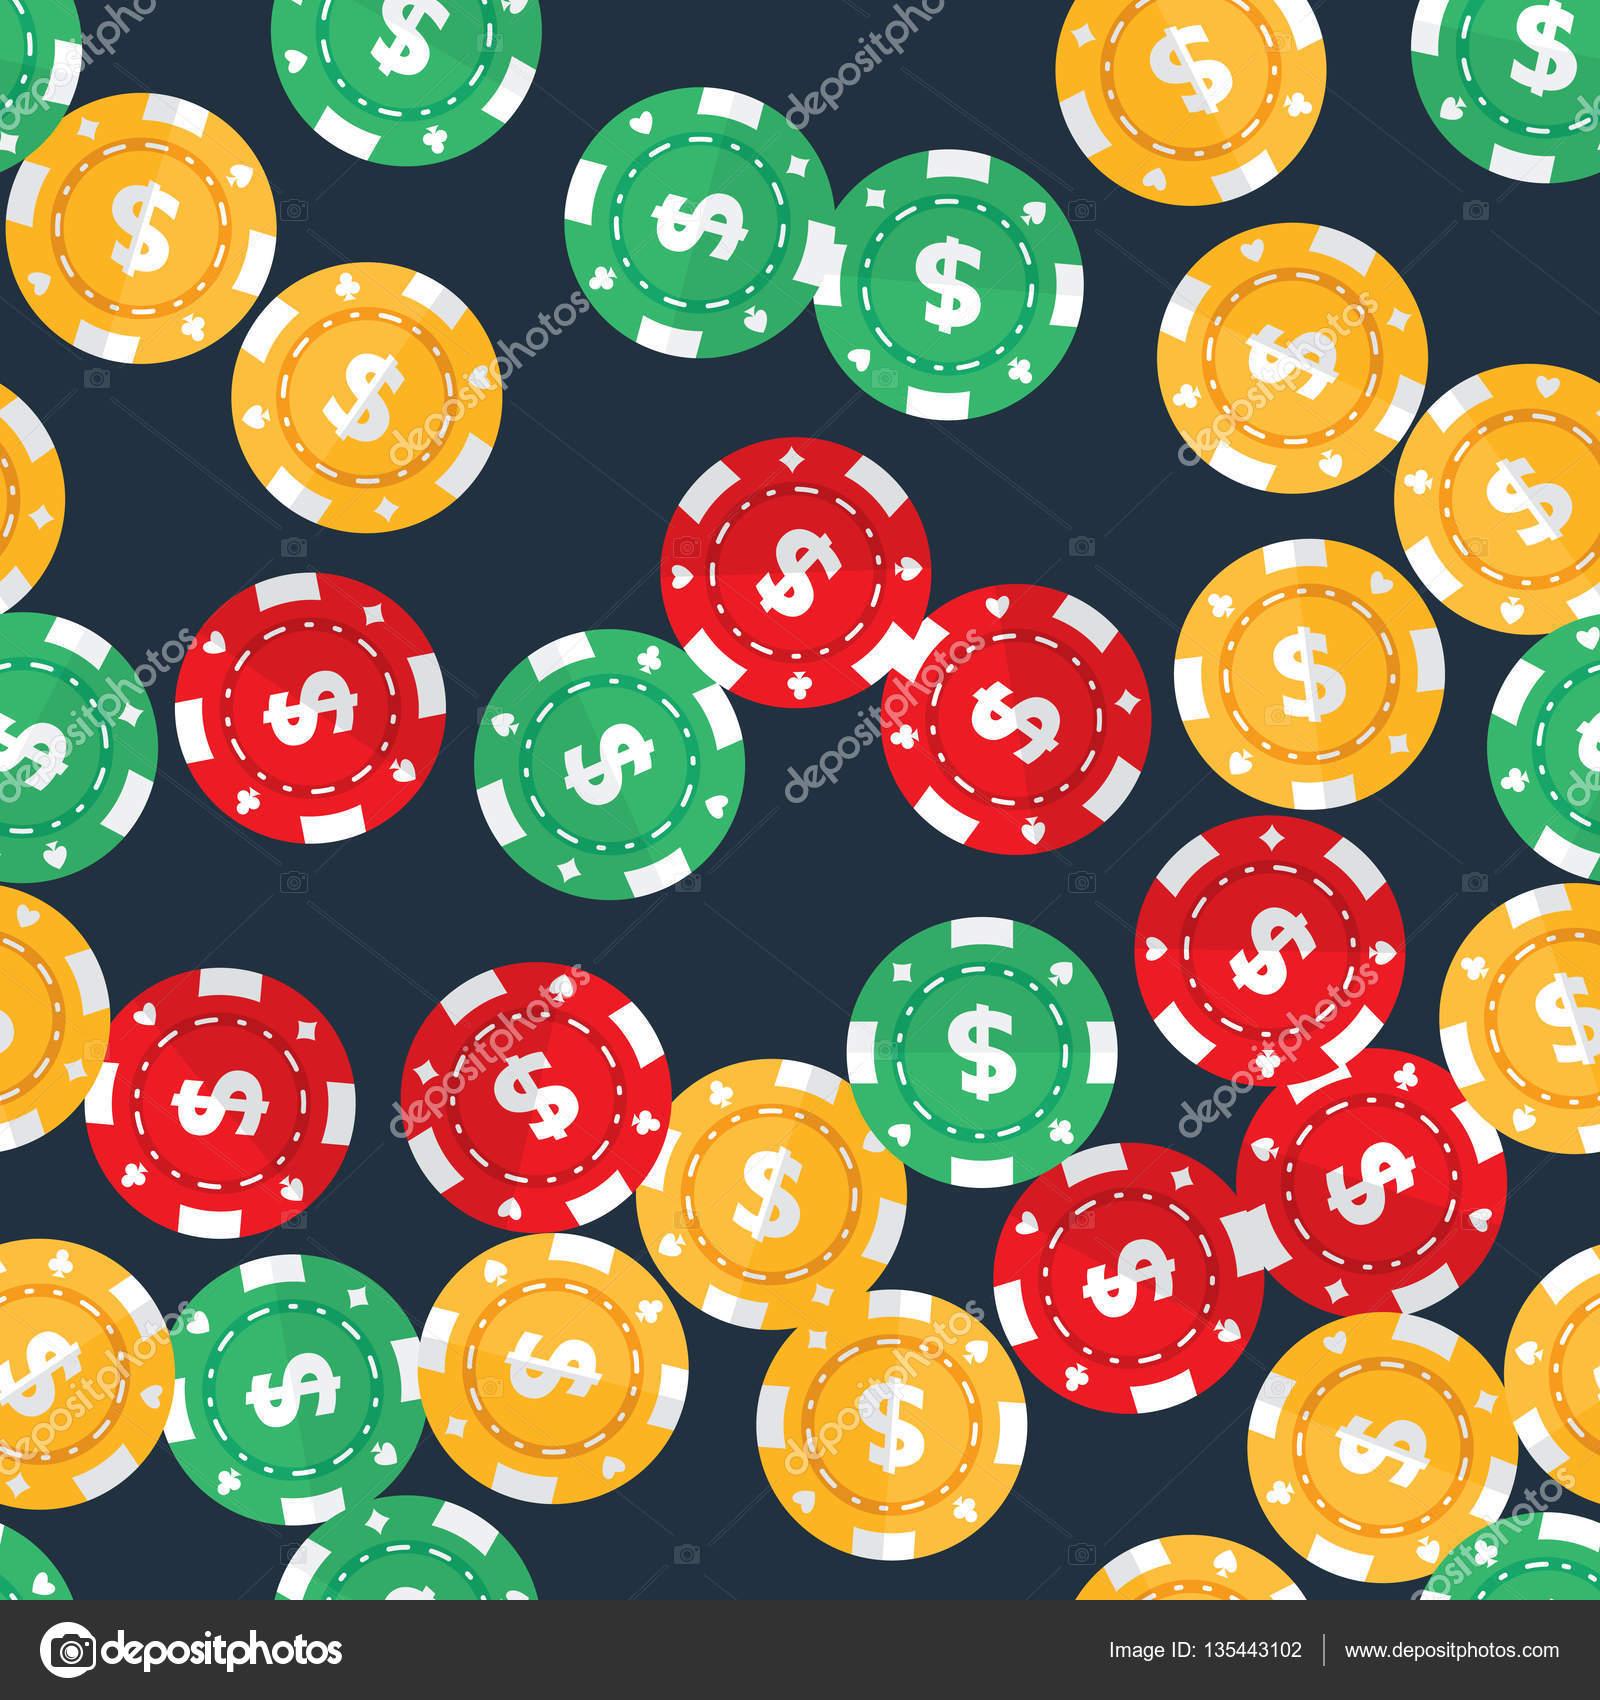 Tdu 2 казино форум